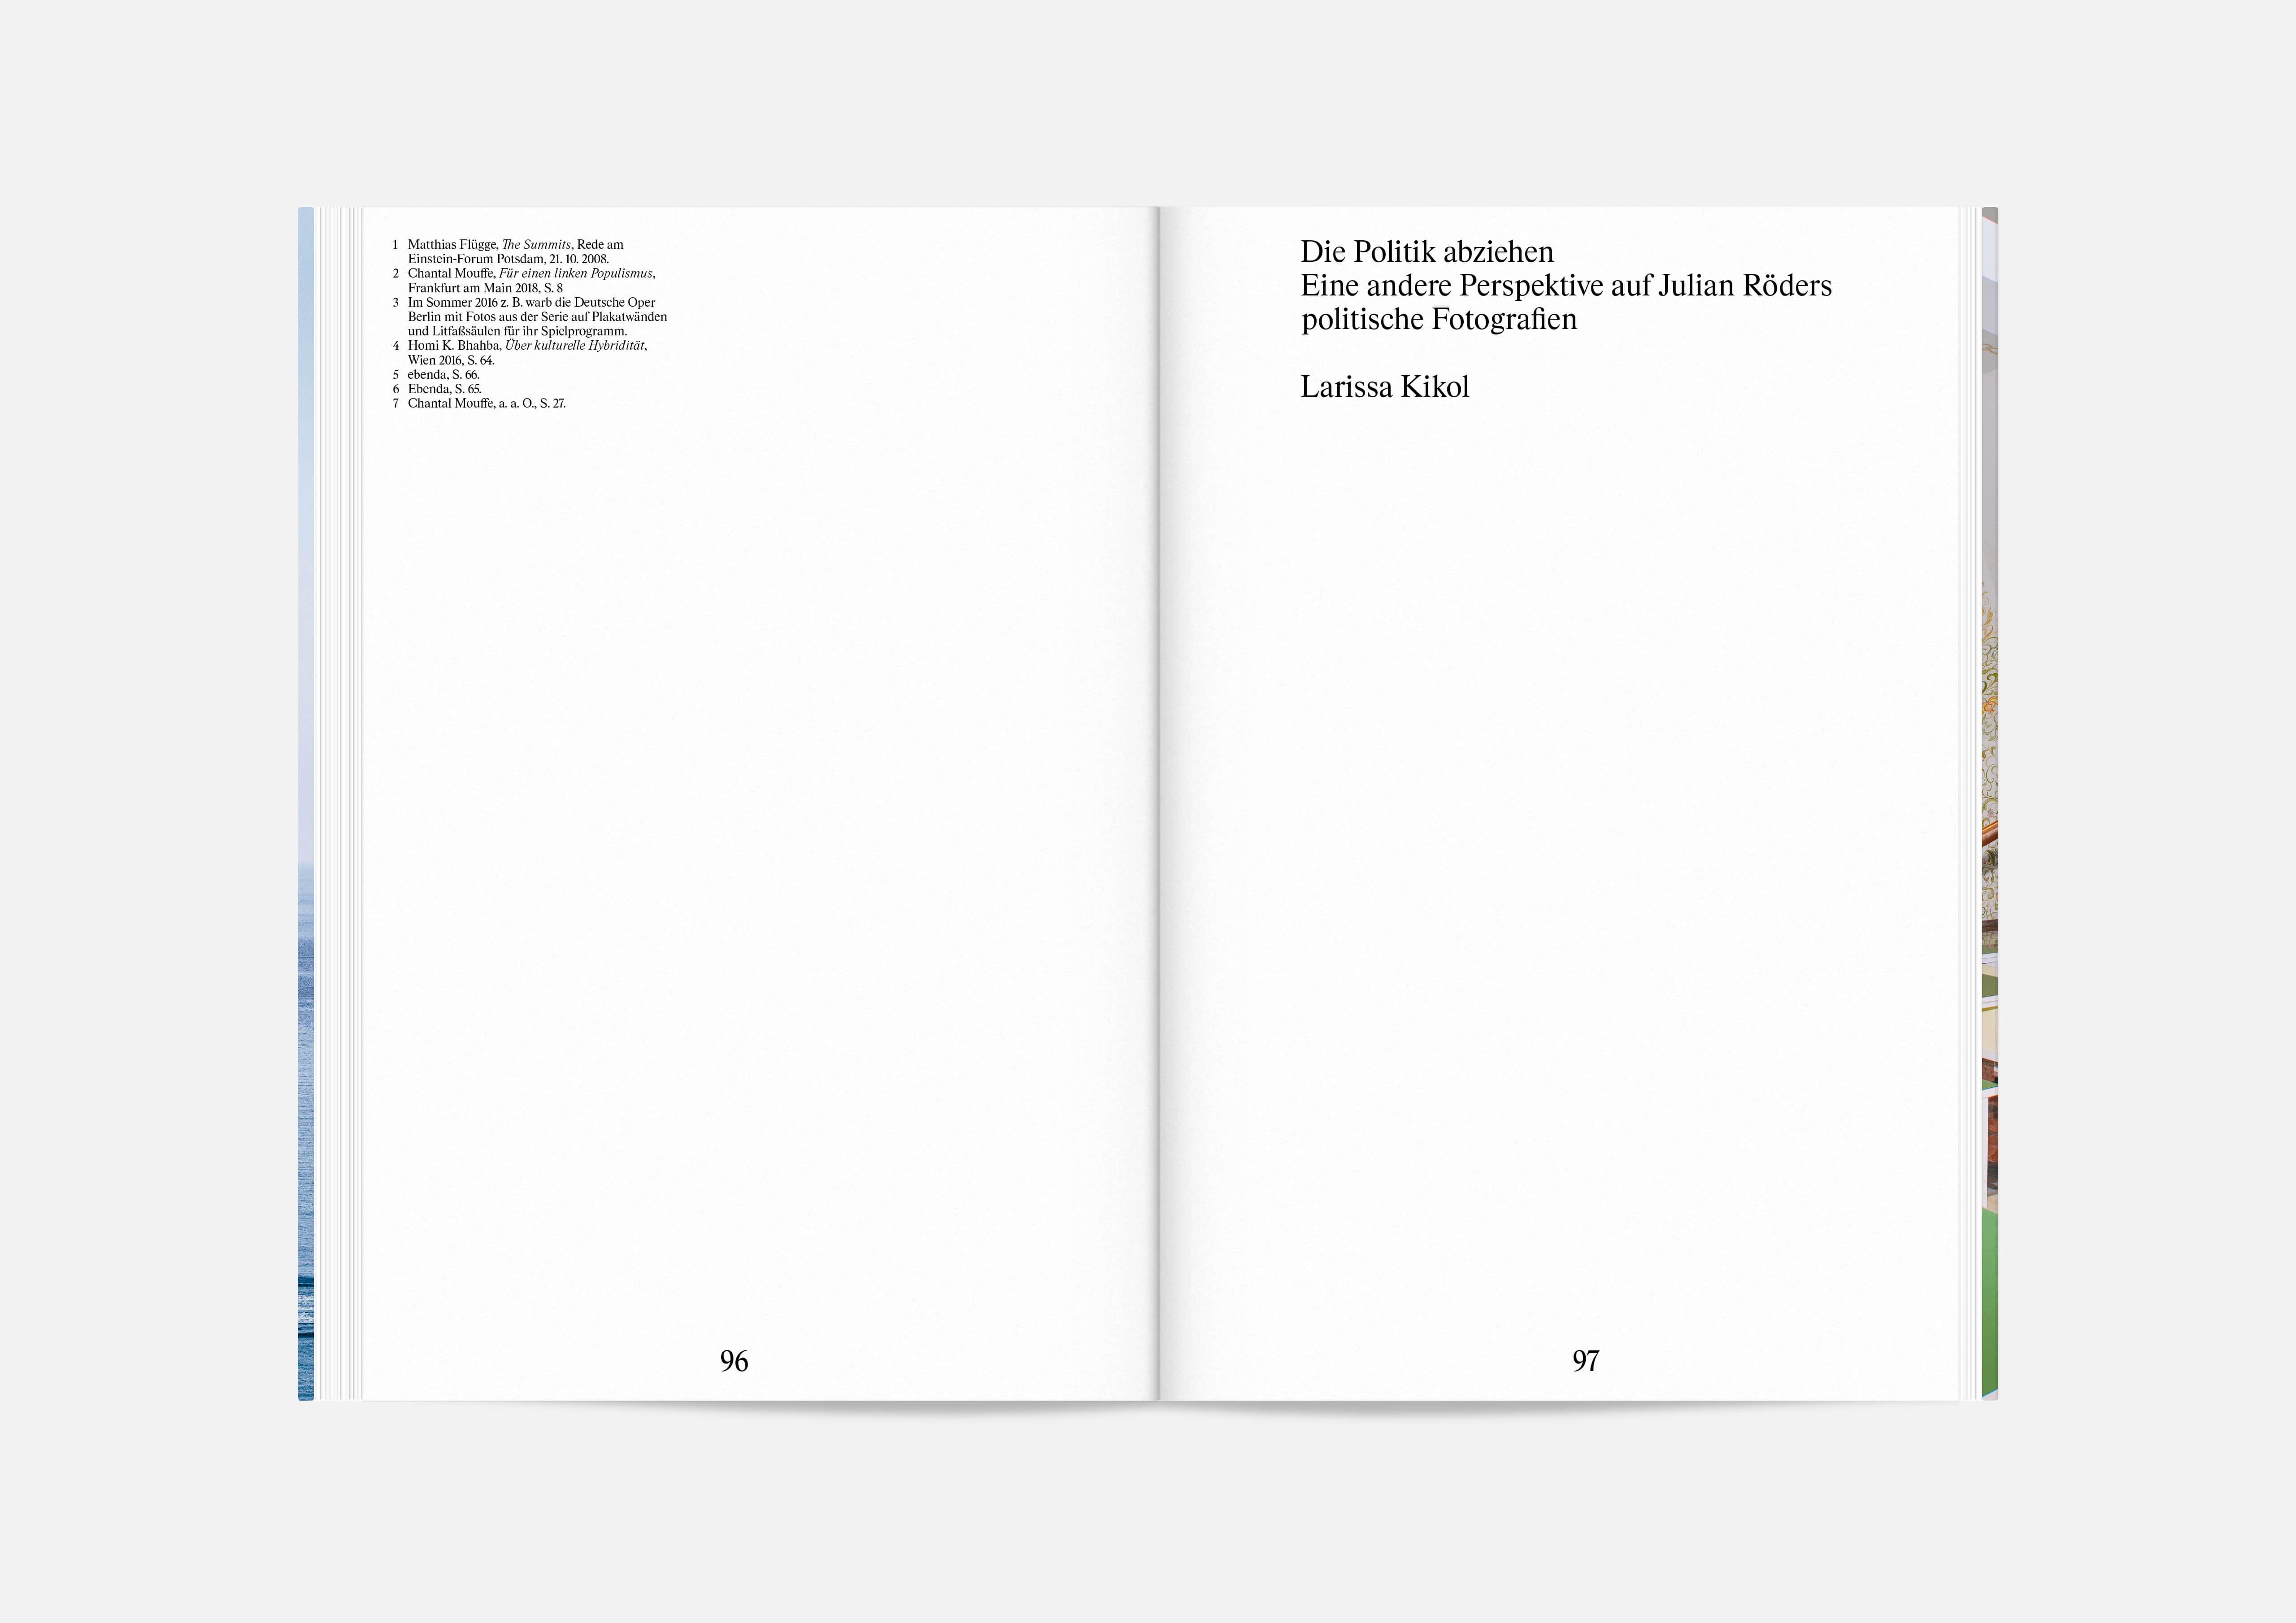 https://neuegestaltung.de/media/pages/clients/julian-roeder/1c764e7192-1610896617/jr-glauben_19.jpg